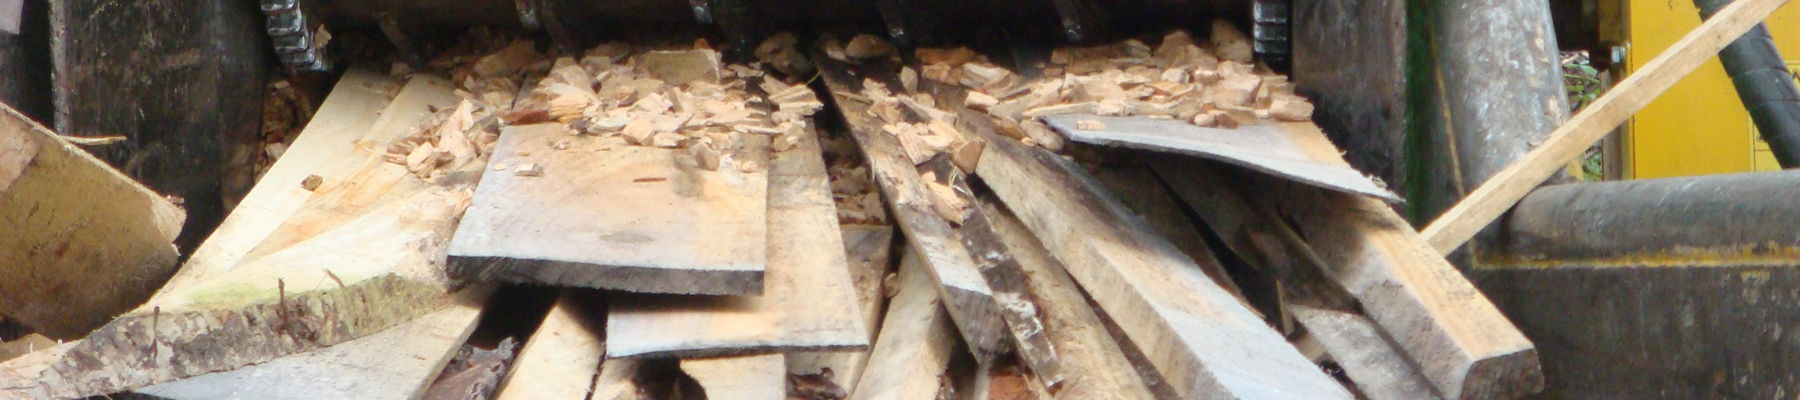 Biomass-fuels9